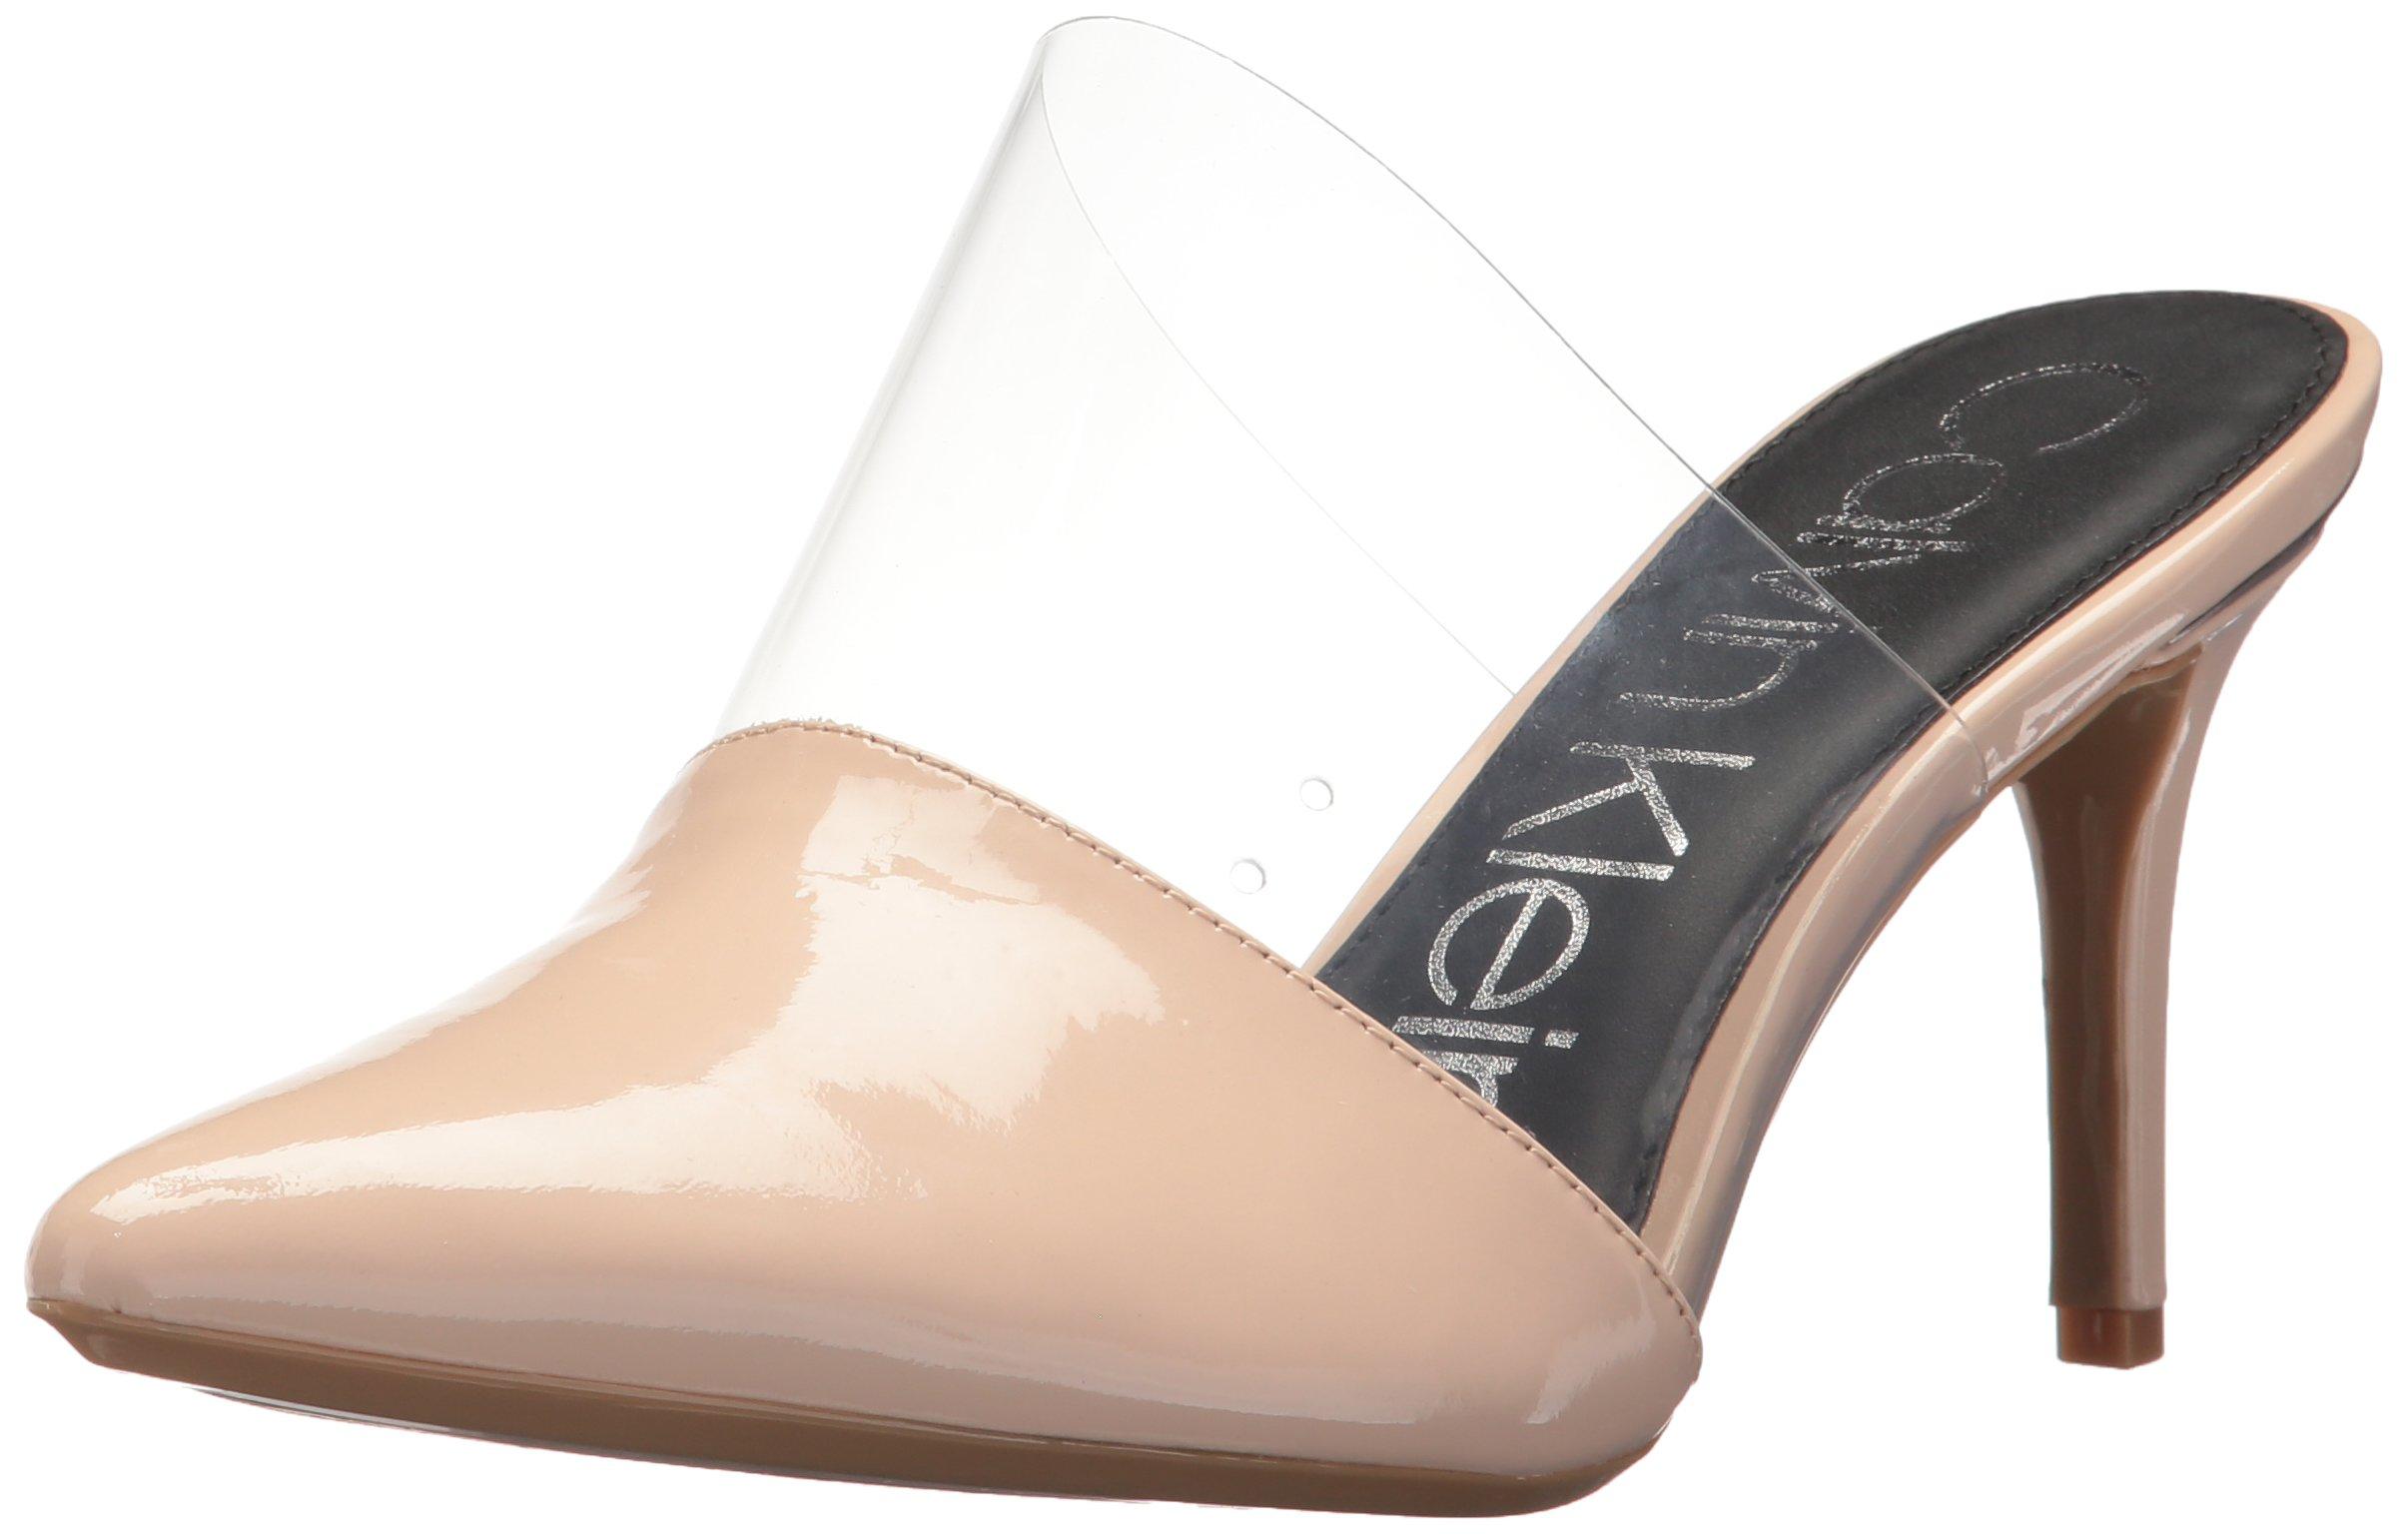 Calvin Klein Women's Graycie 2 Pump, Sheer Satin, 5.5 Medium US